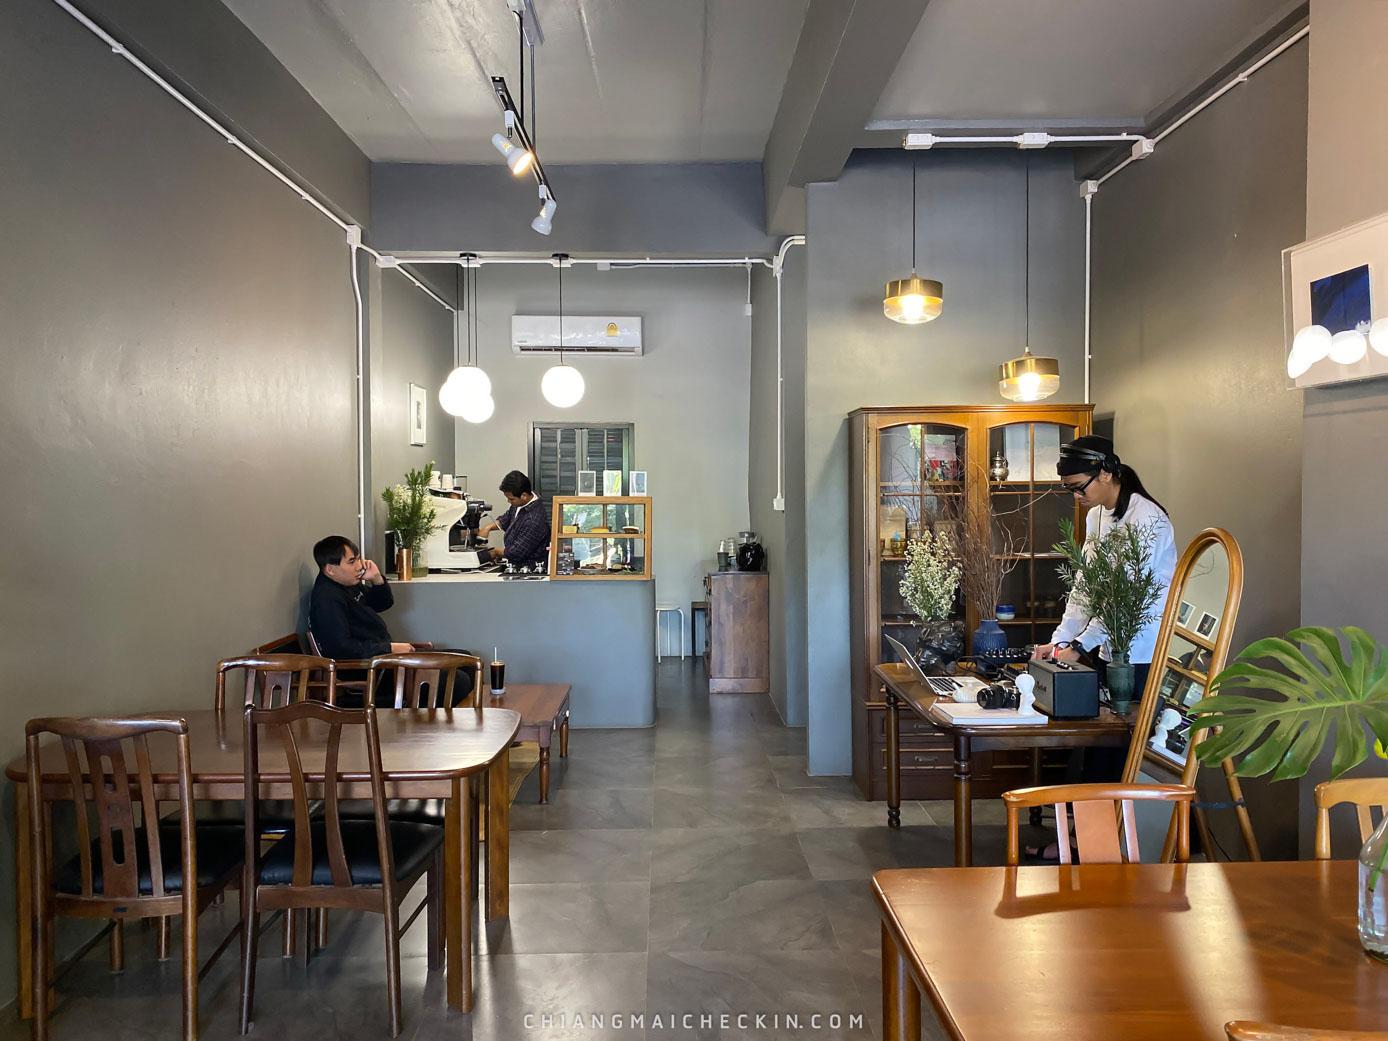 Klom cafe ร้านเก่าแก่ของเชียงใหม่ตกแต่งสดใสน่ารักๆเจ้าของร้านใจดี กาแฟกลมกล่อมราคาไม่แพงต้องห้ามพลาดด